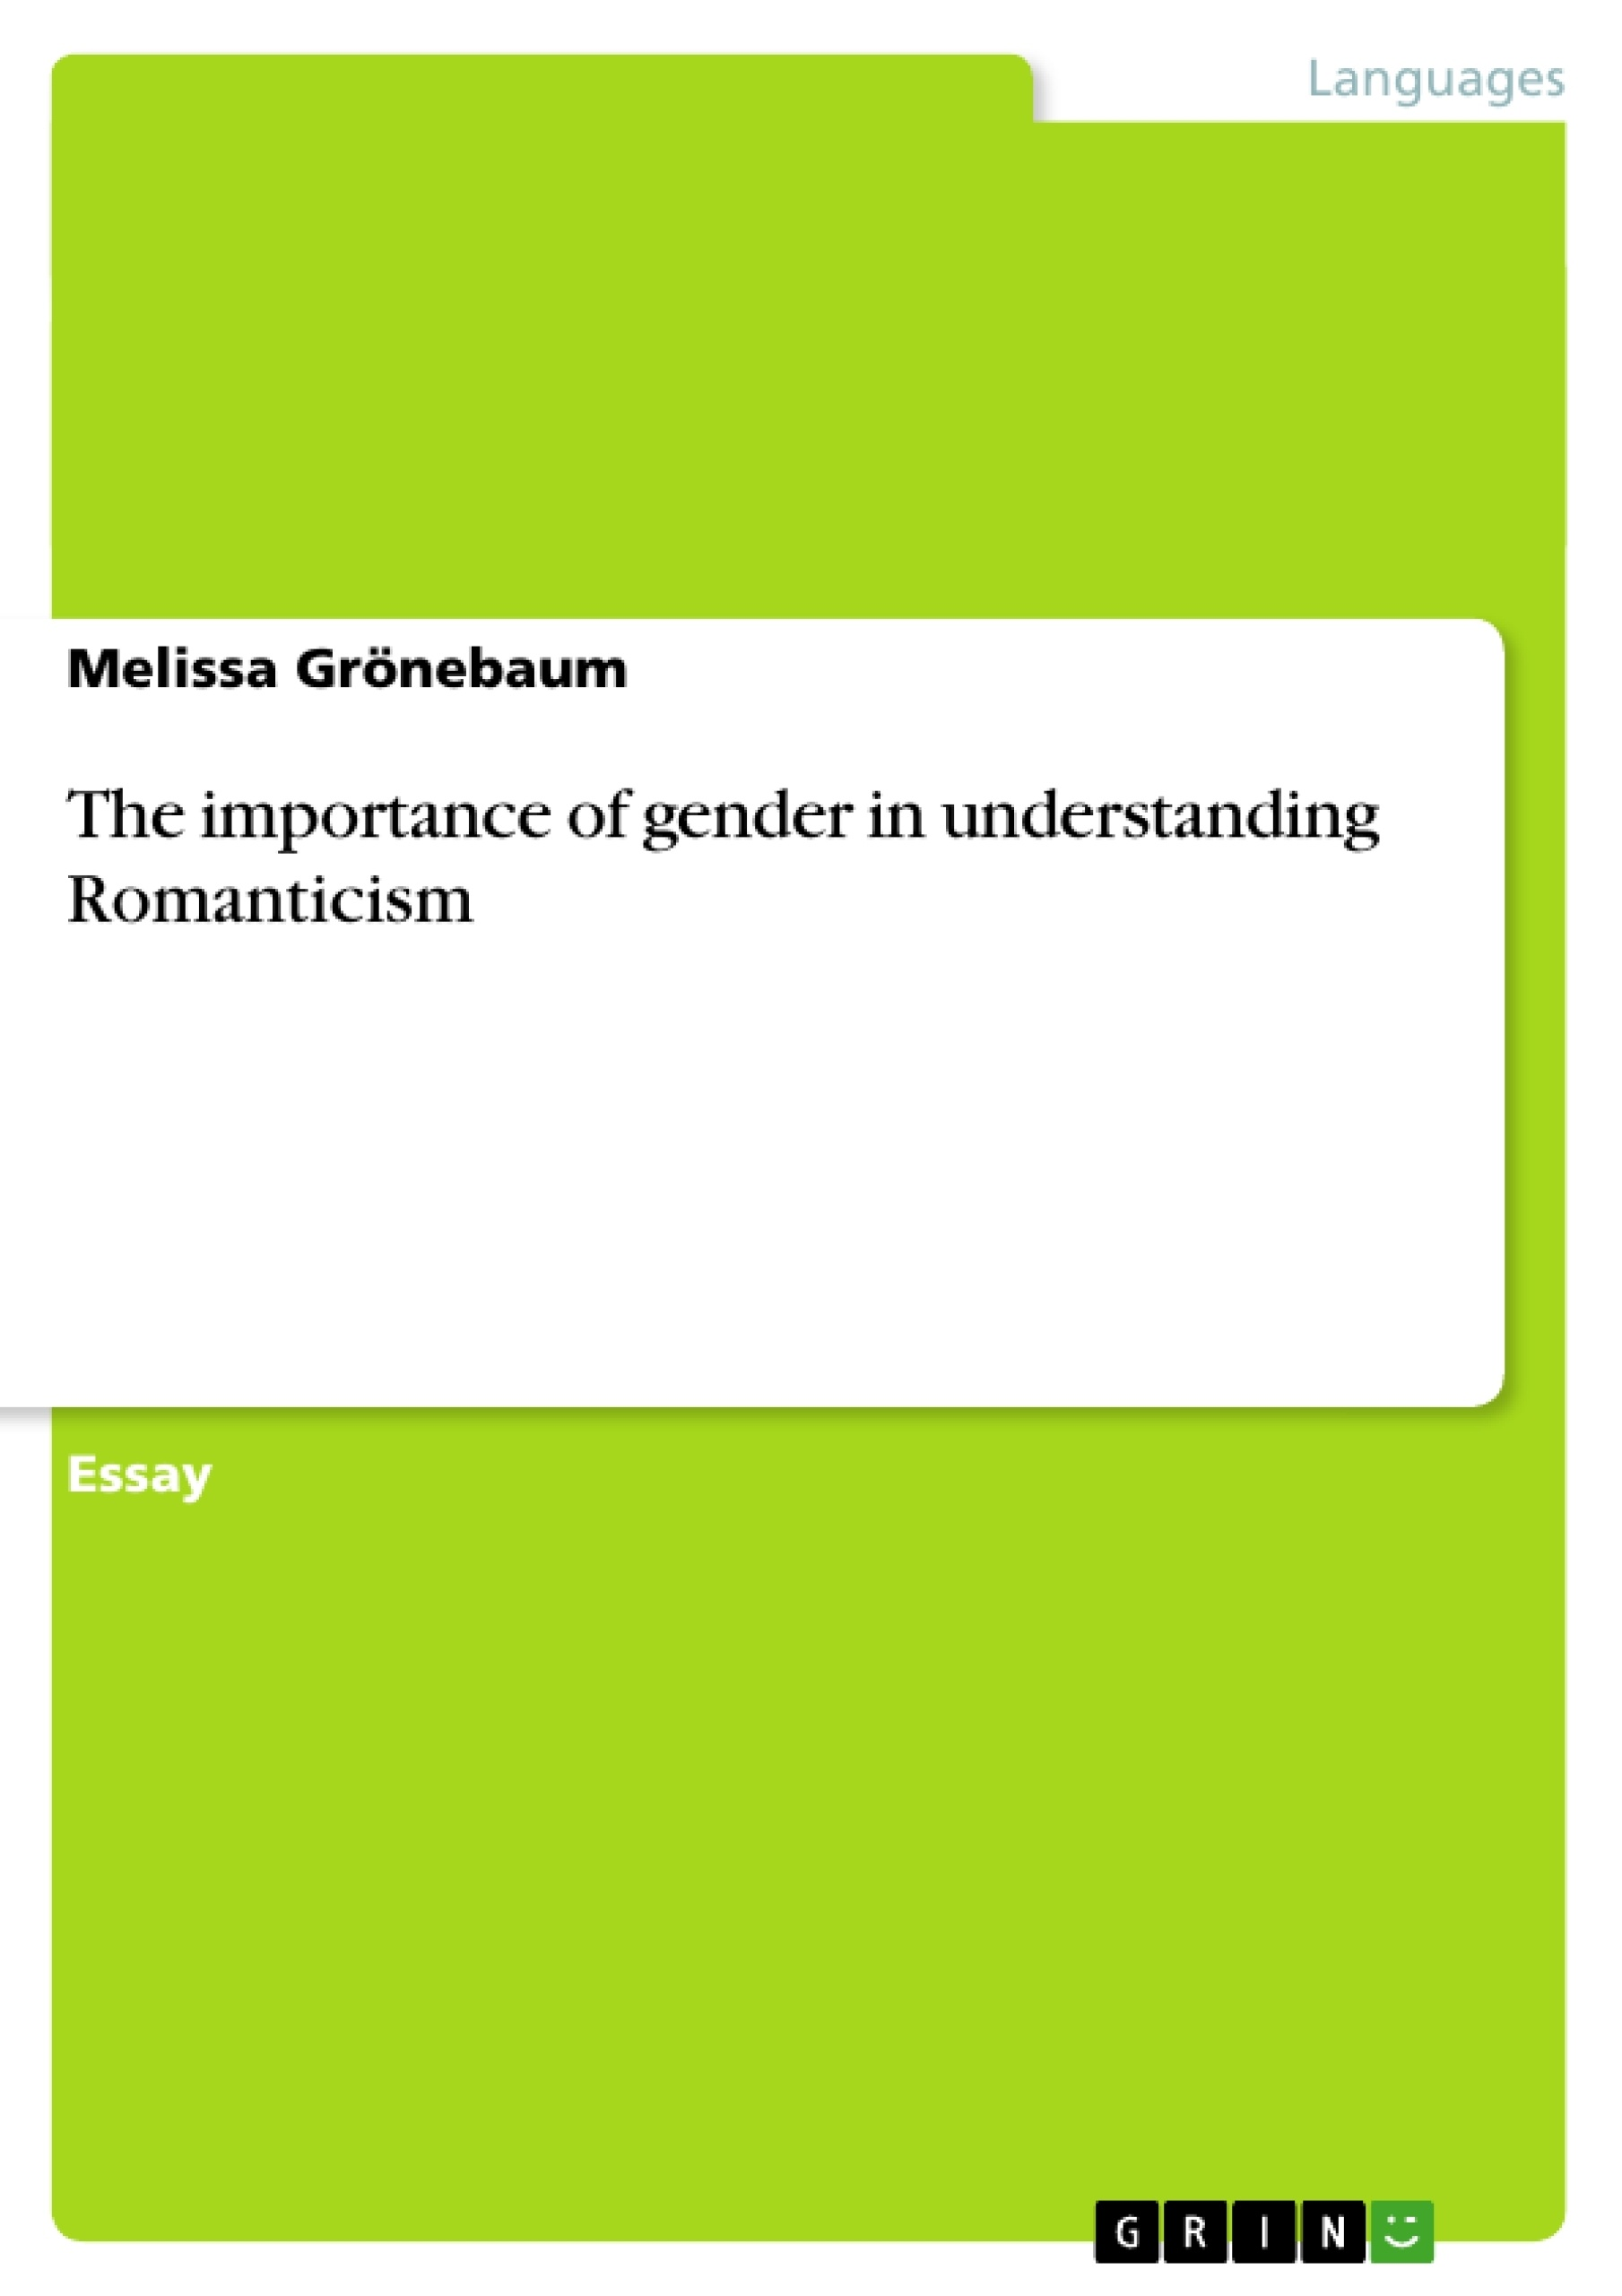 Title: The importance of gender in understanding Romanticism